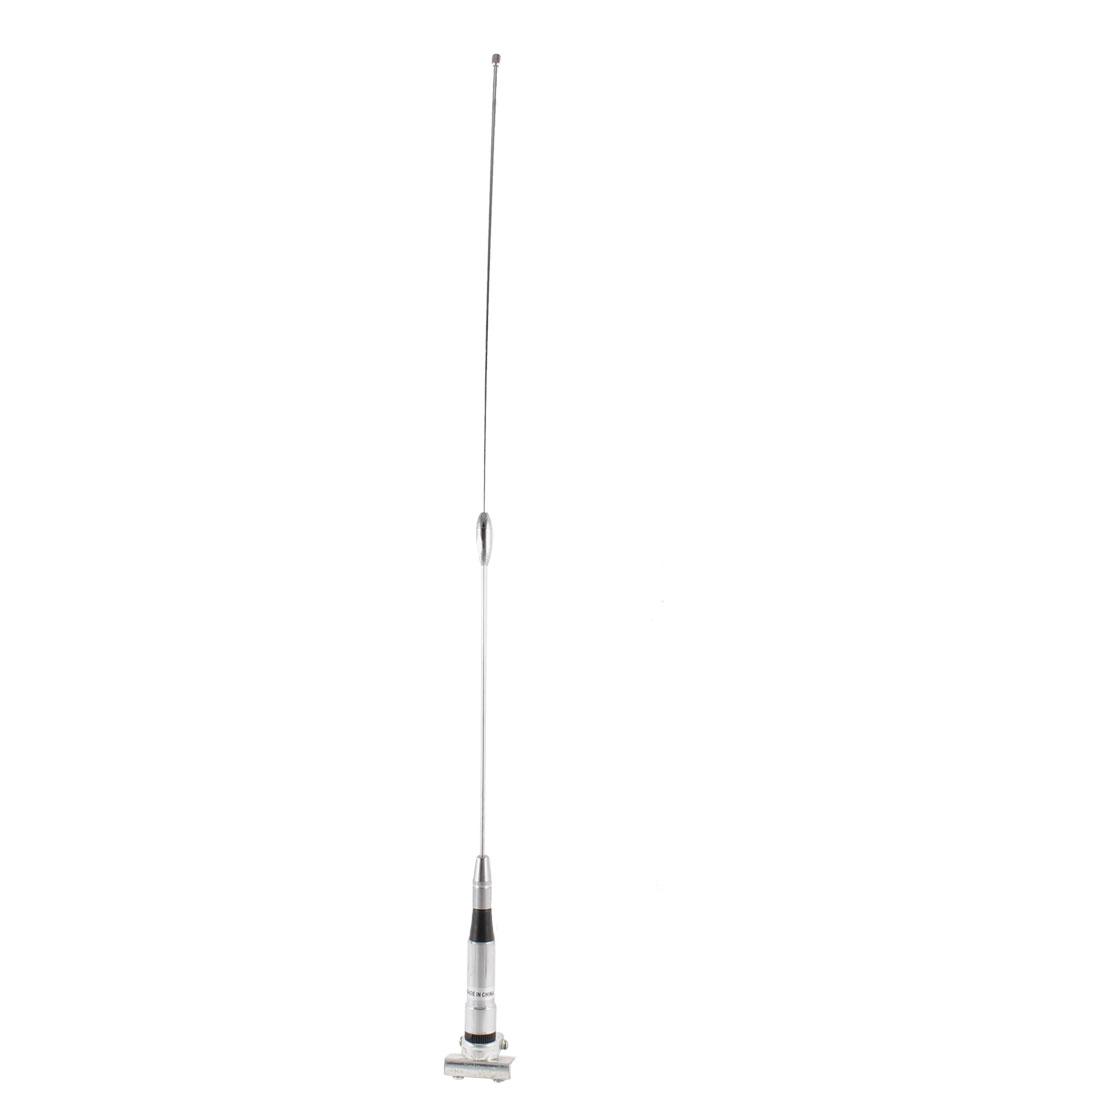 "Metal Base Car Truck Radio FM AM Assist Antenna 22.8"" Length Pole Silver Tone"